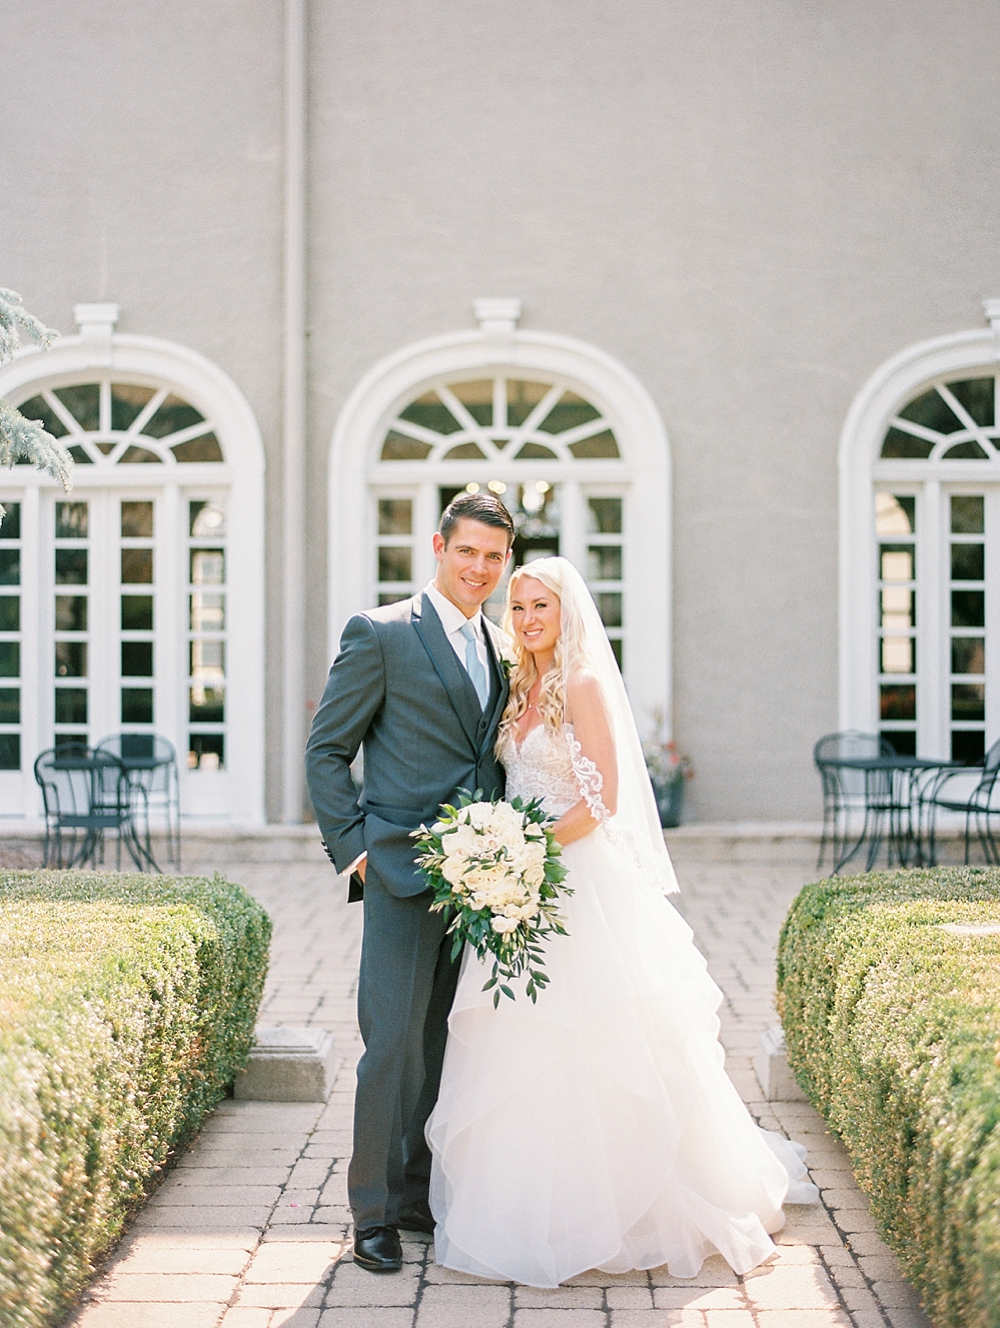 kristin-la-voie-photography-lehmann-mansion-wedding-photographer-81